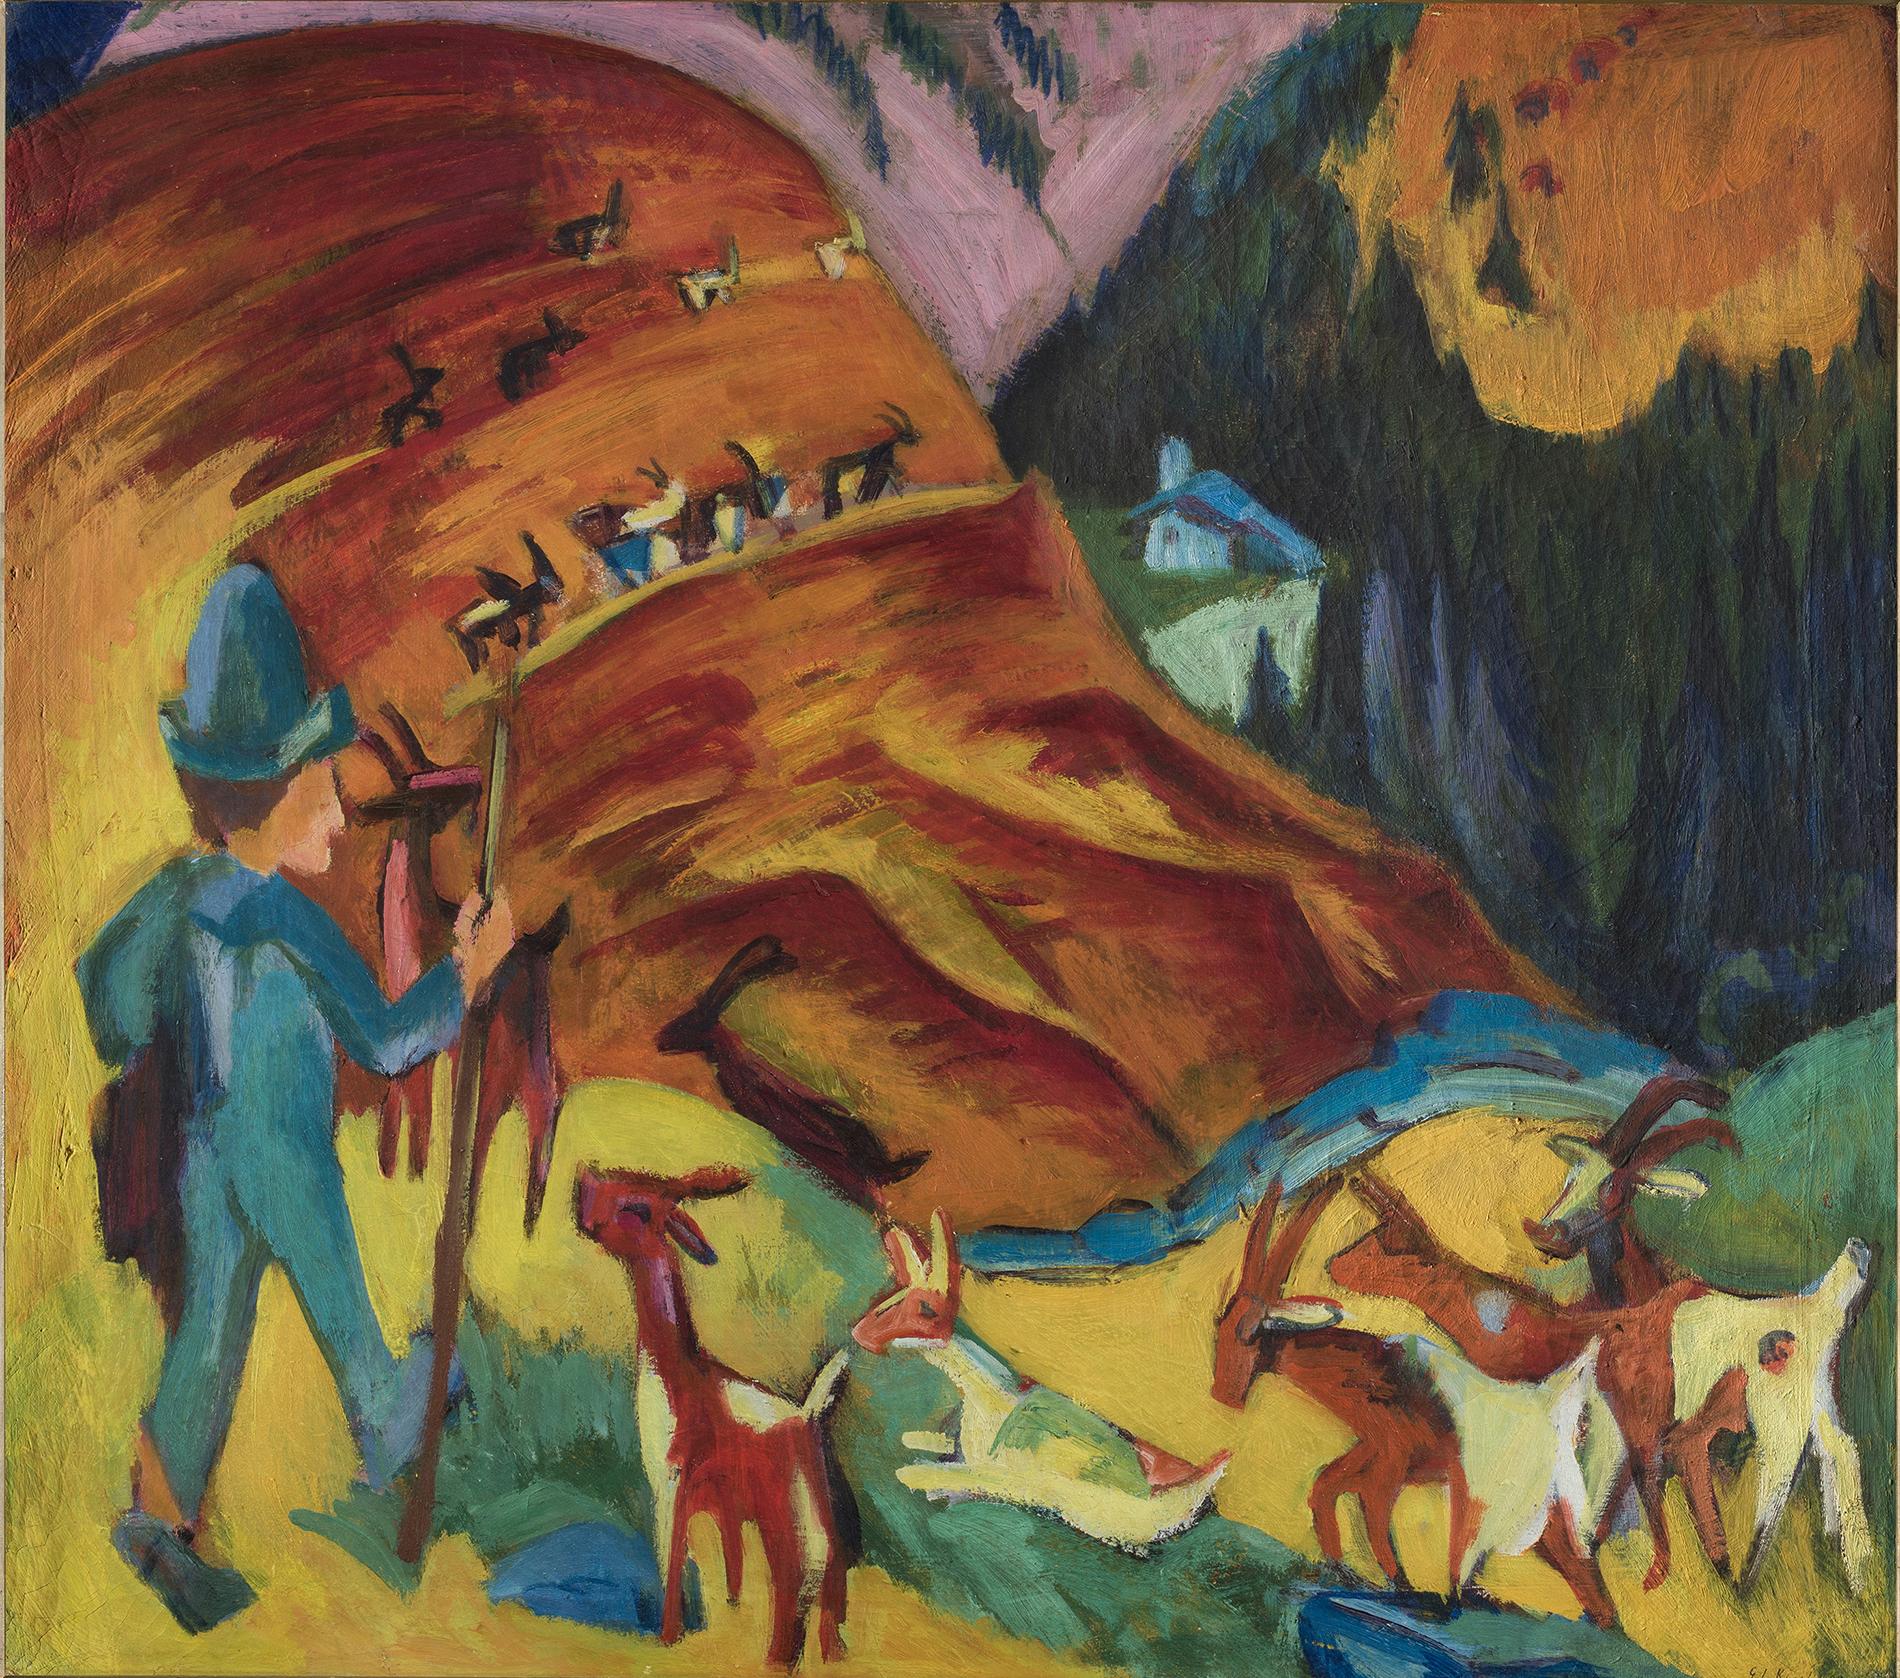 Ernst Ludwig Kirchner, Heimkehrende Ziegenherde, 1920, Öl auf Leinwand, Fondazione Gabriele e Anna Braglia, Lugano. Foto: Roberto Pellegrini